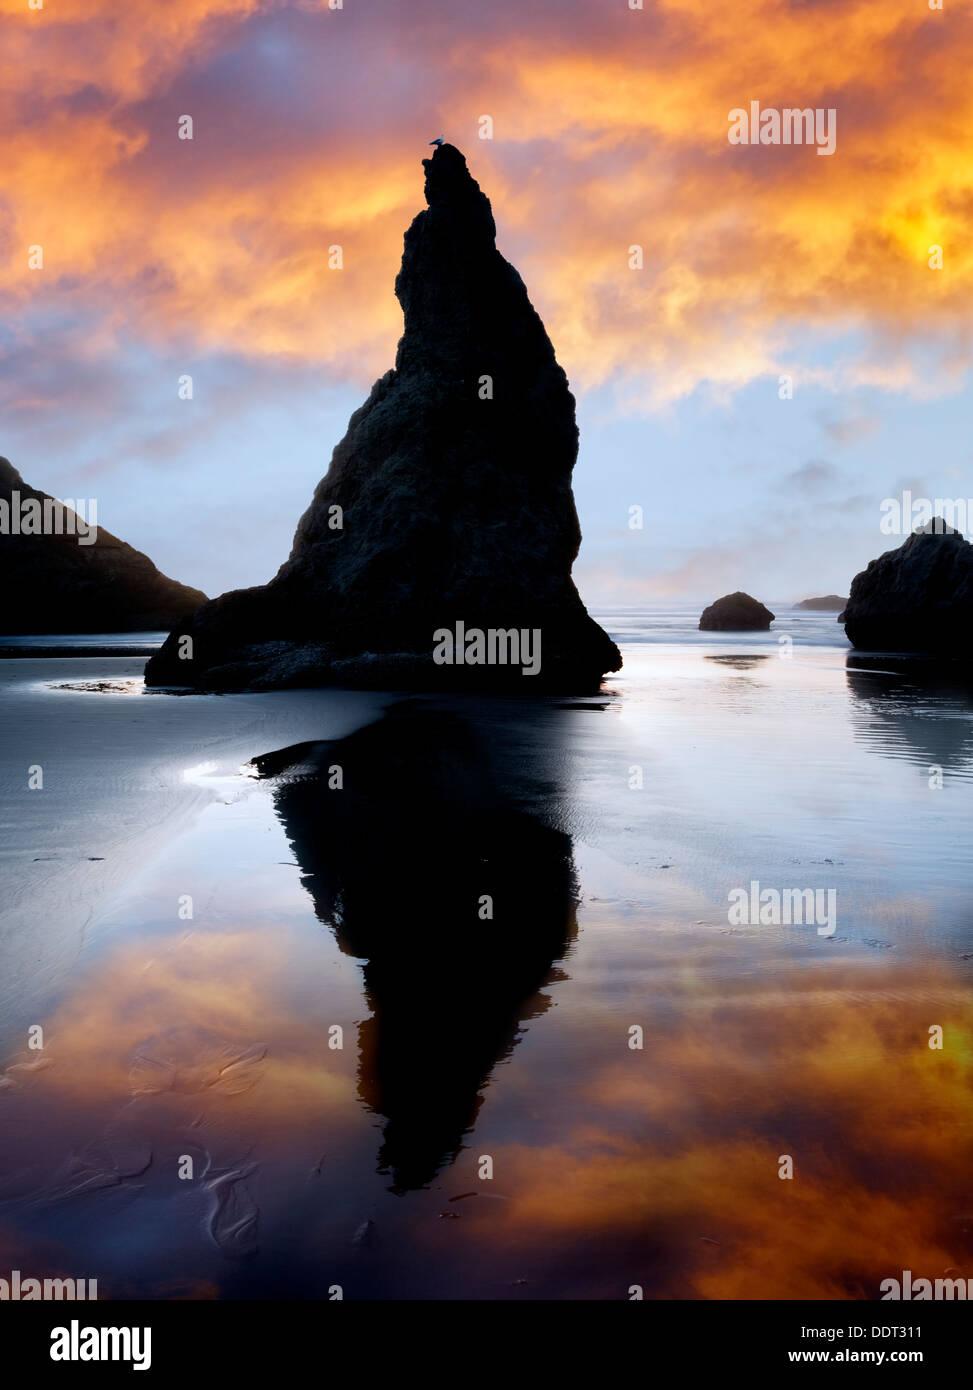 Rocks at Bandon with reflection at sunset. Oregon - Stock Image